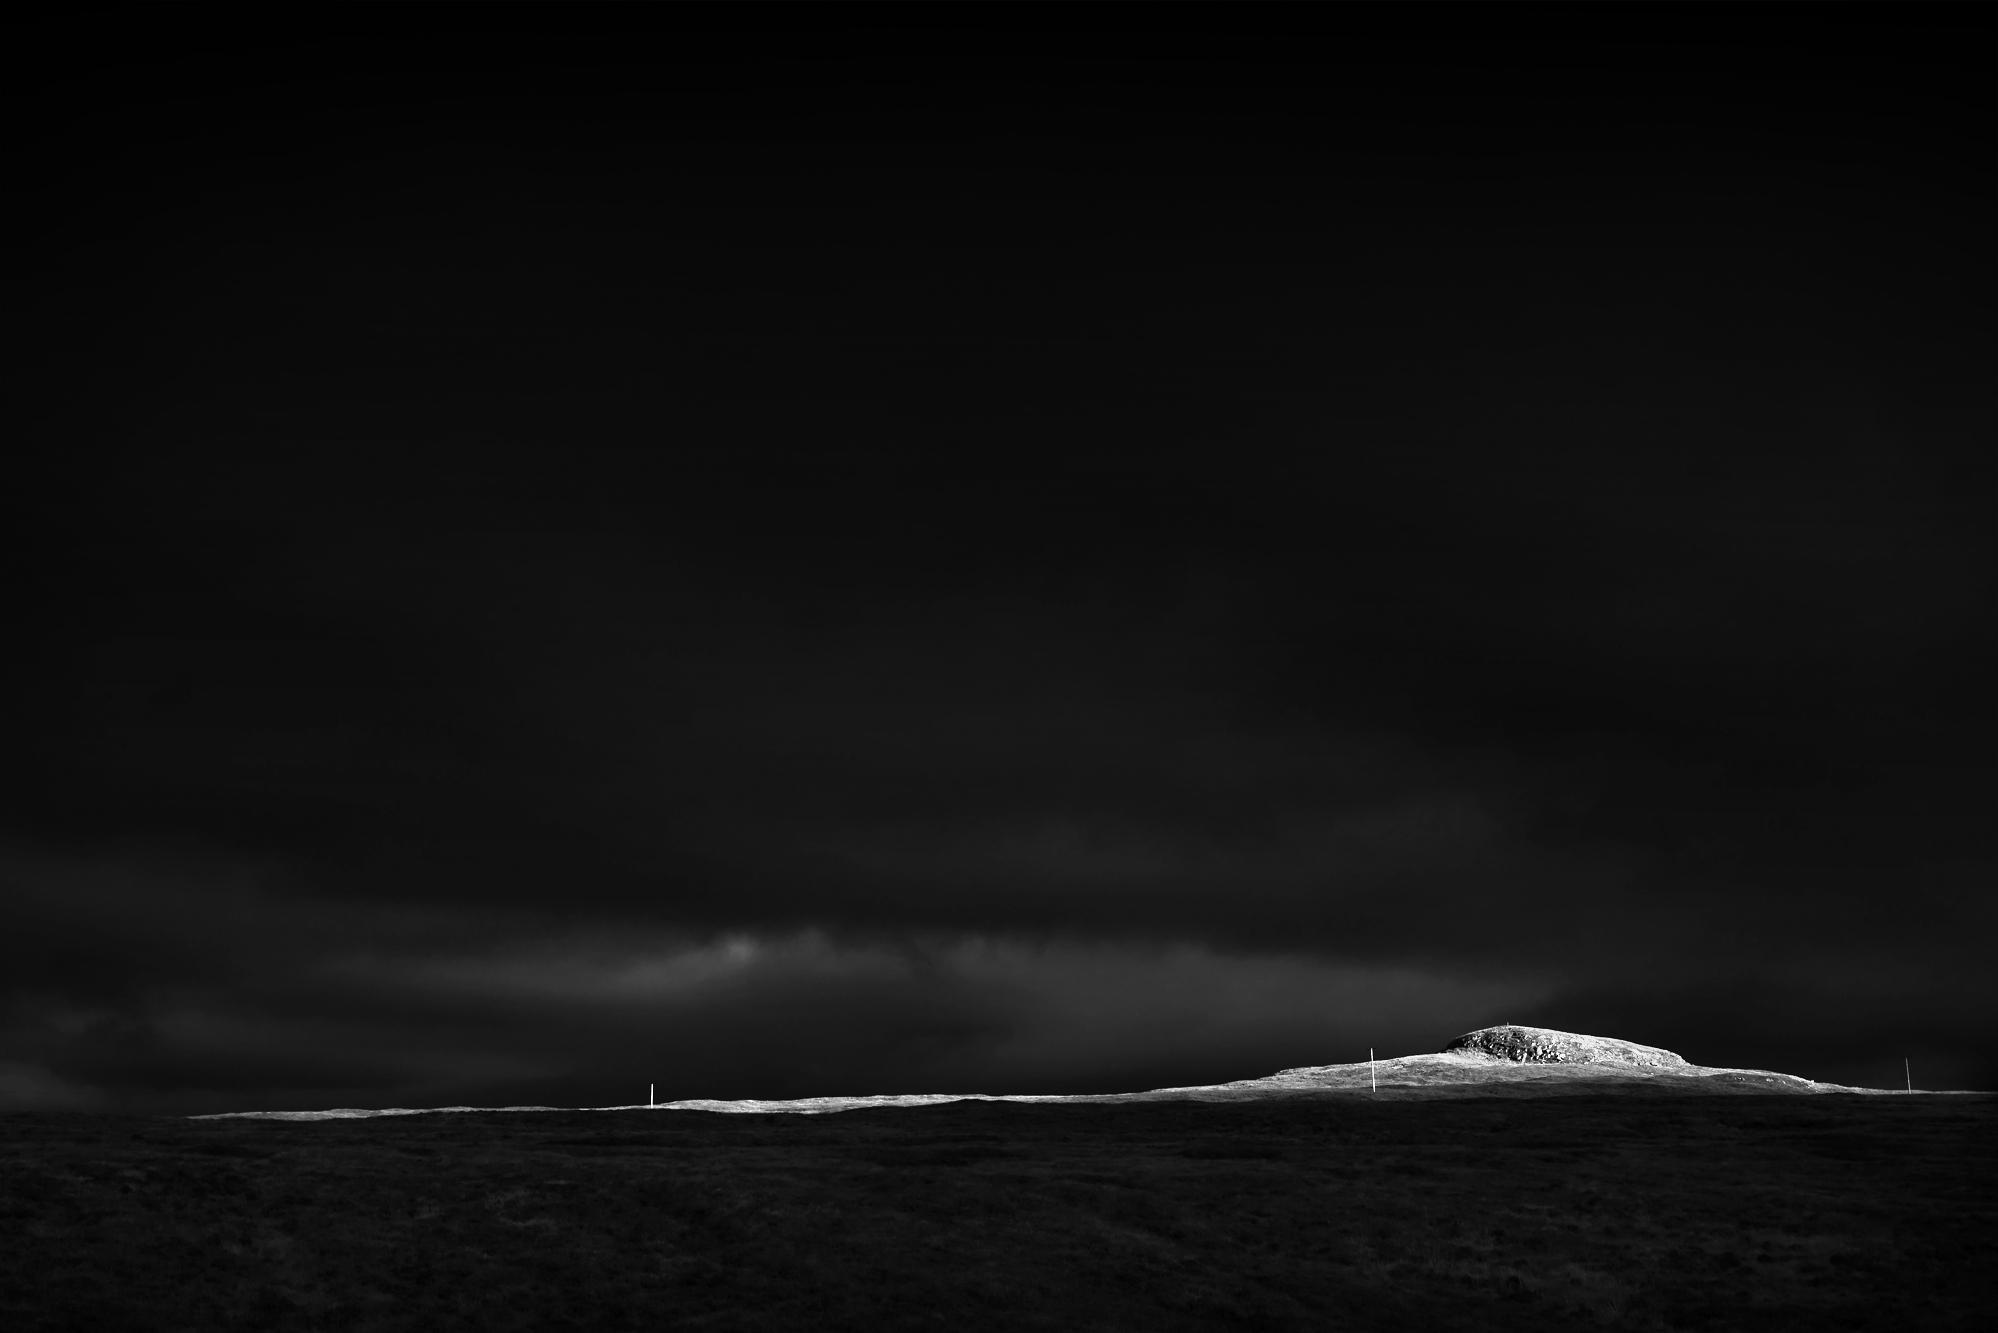 Chris Clor black and white landscape